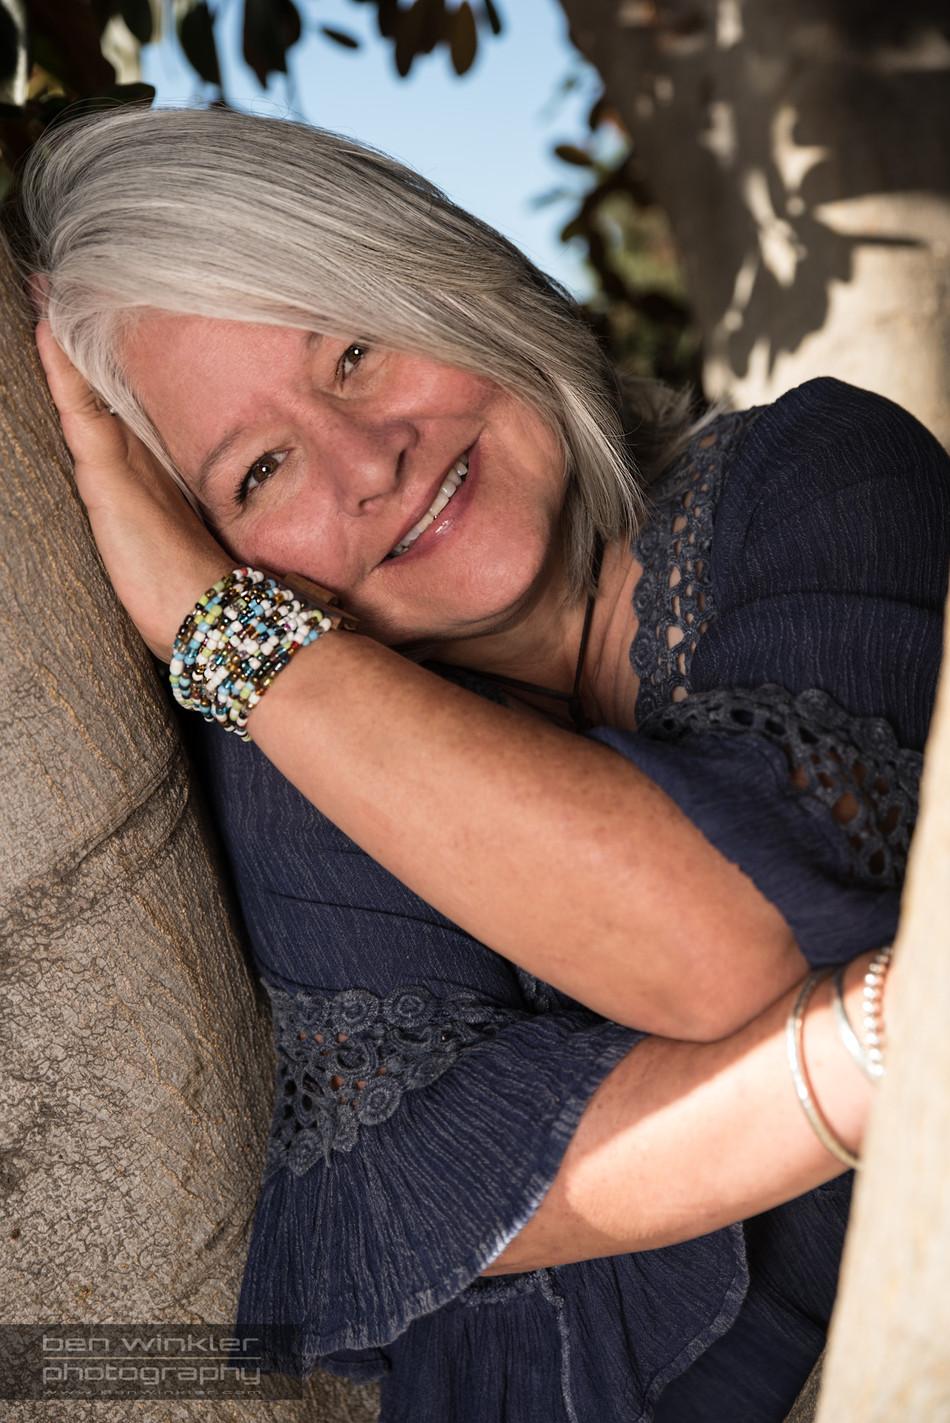 Meet Karen - Faces of Silver